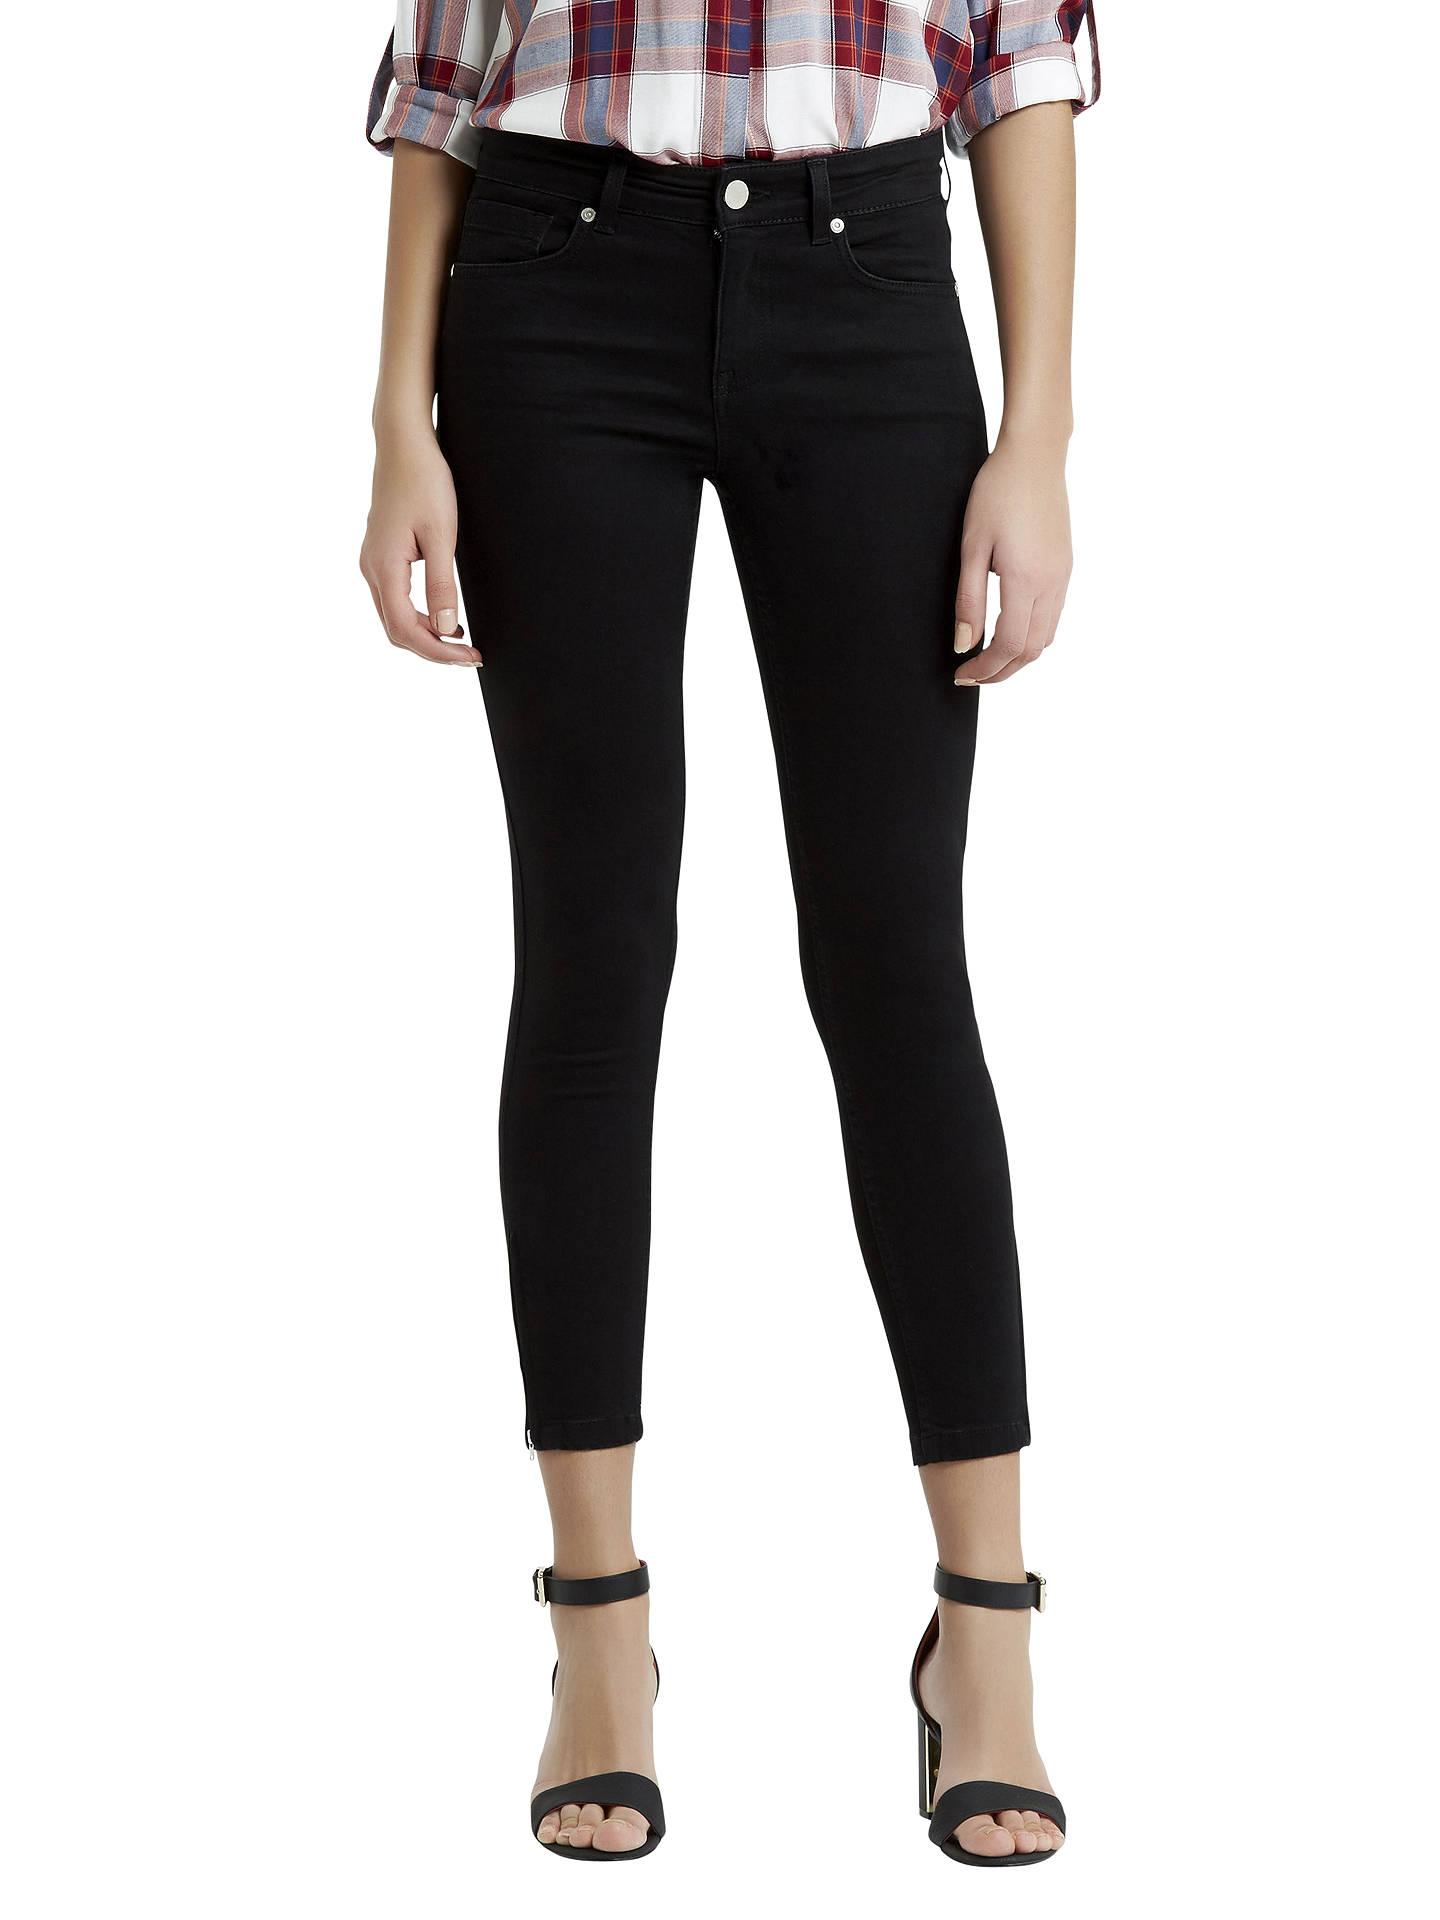 204f833fcd8e Buy Oasis Isabella Skinny Cropped Jeans, Black, 8 Online at johnlewis.com  ...